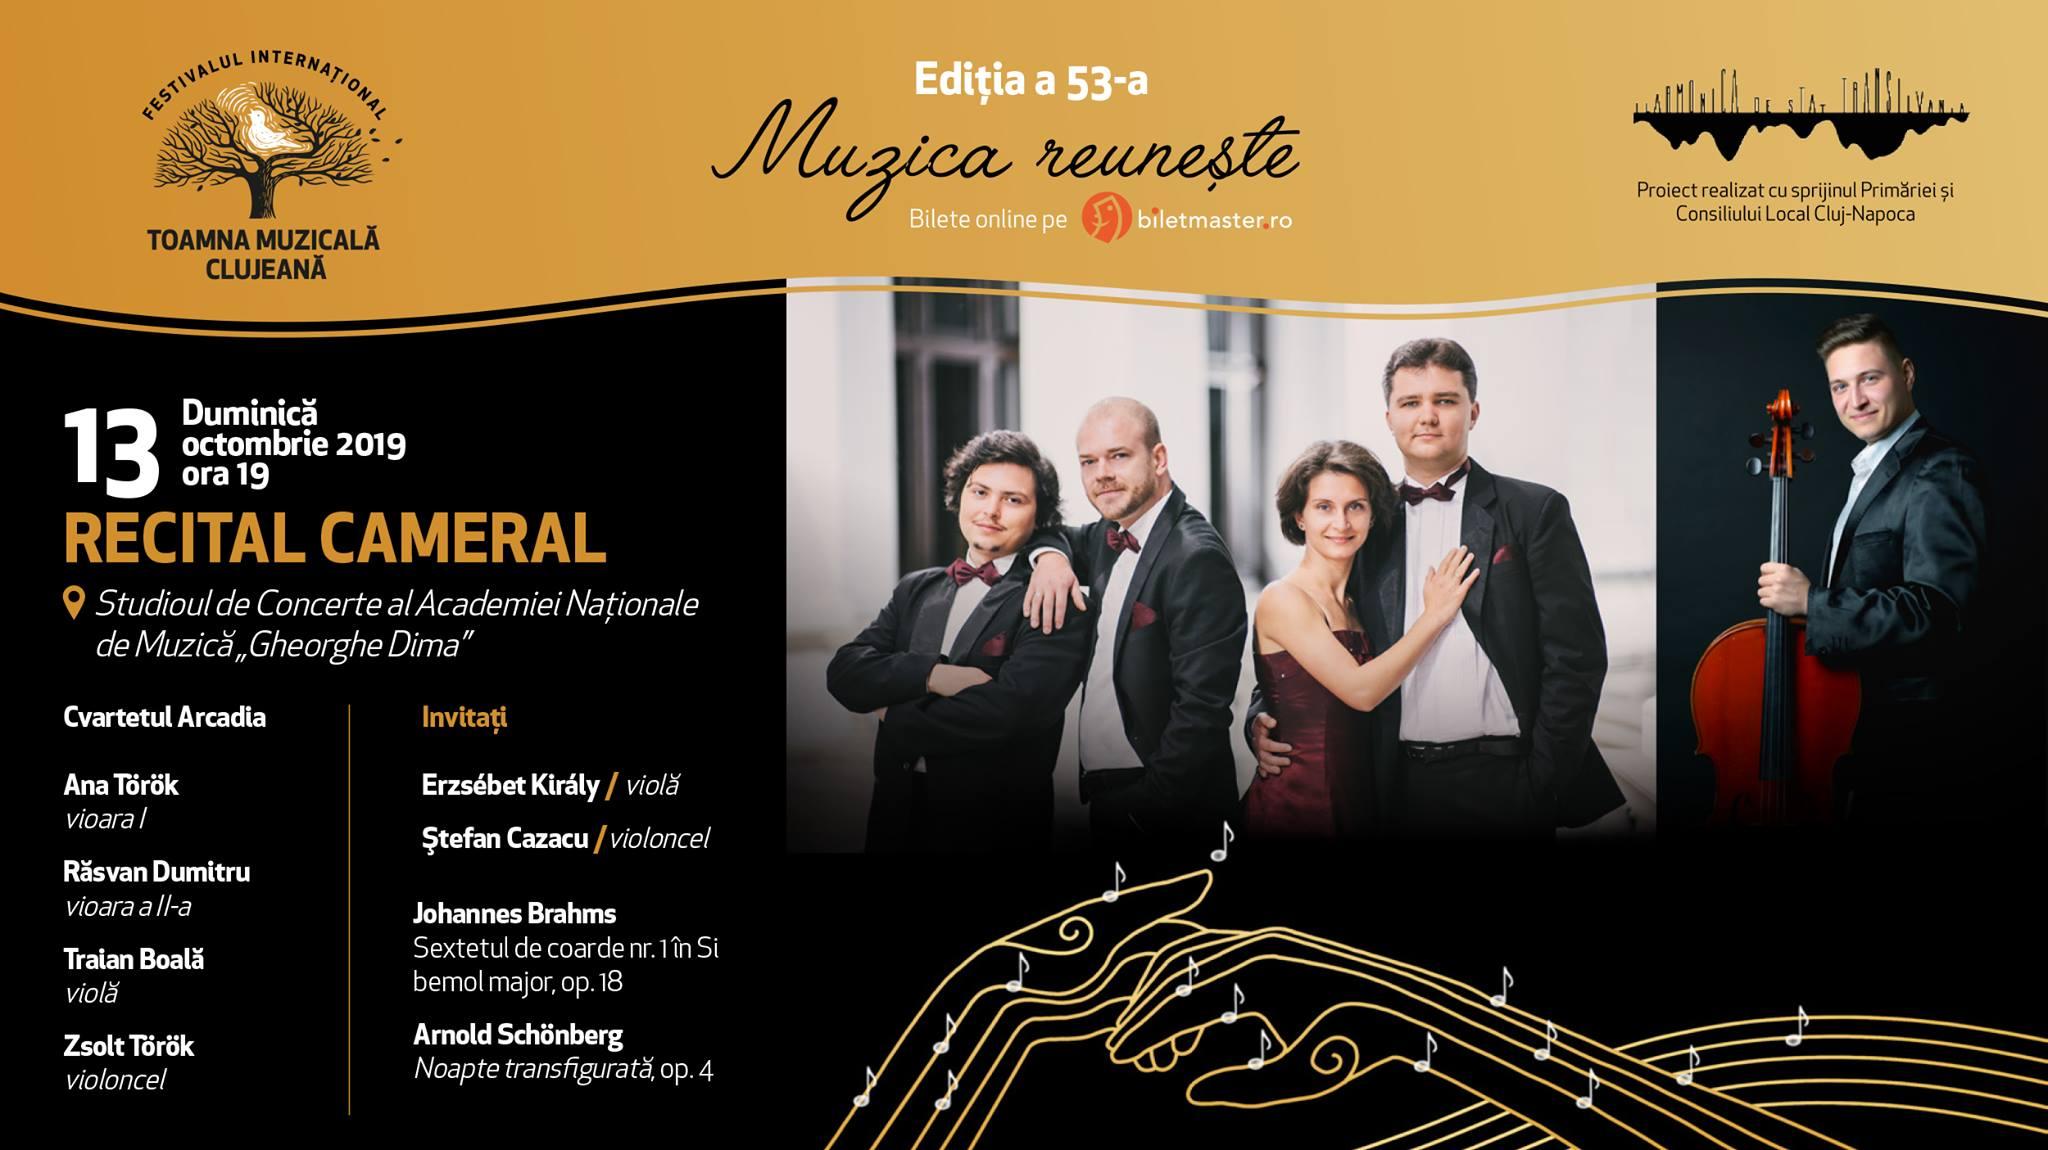 Cvartetul Arcadia – recital cameral